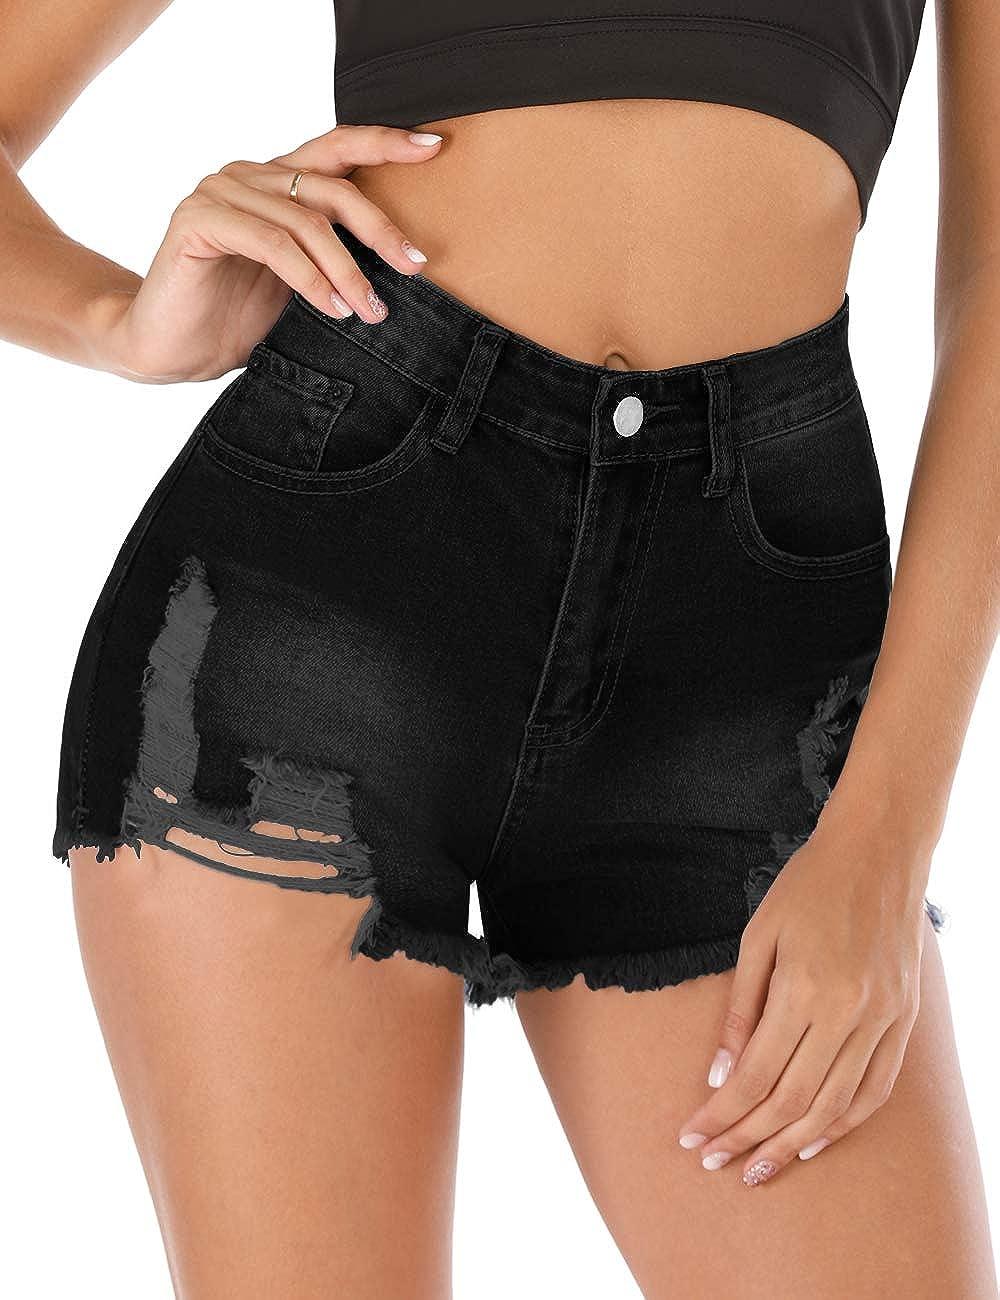 Ulanda Shorts for Women Casual Jean Shorts High Waisted Ruffle Hemming Denim Ripped Short Jeans Pockets